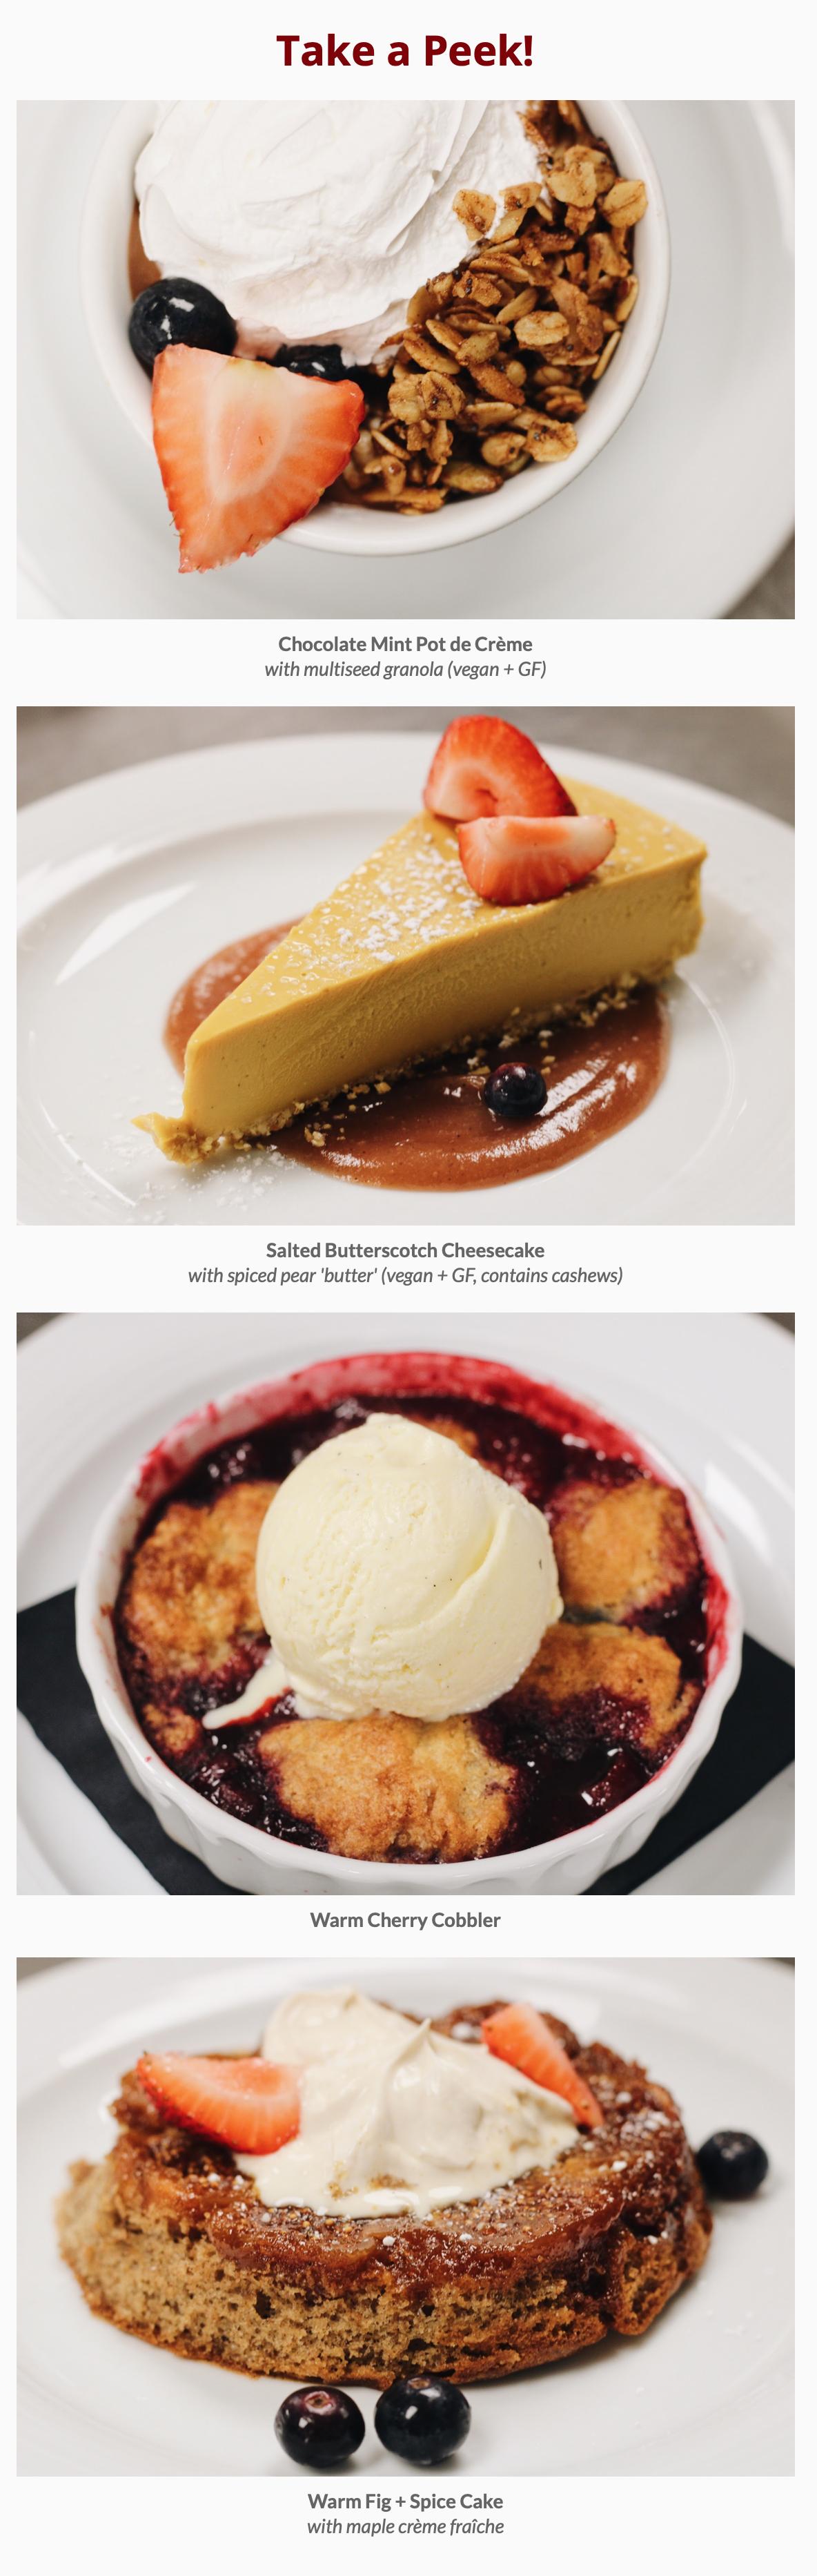 Irregardless-Cafe-Fall-Desserts-Listed